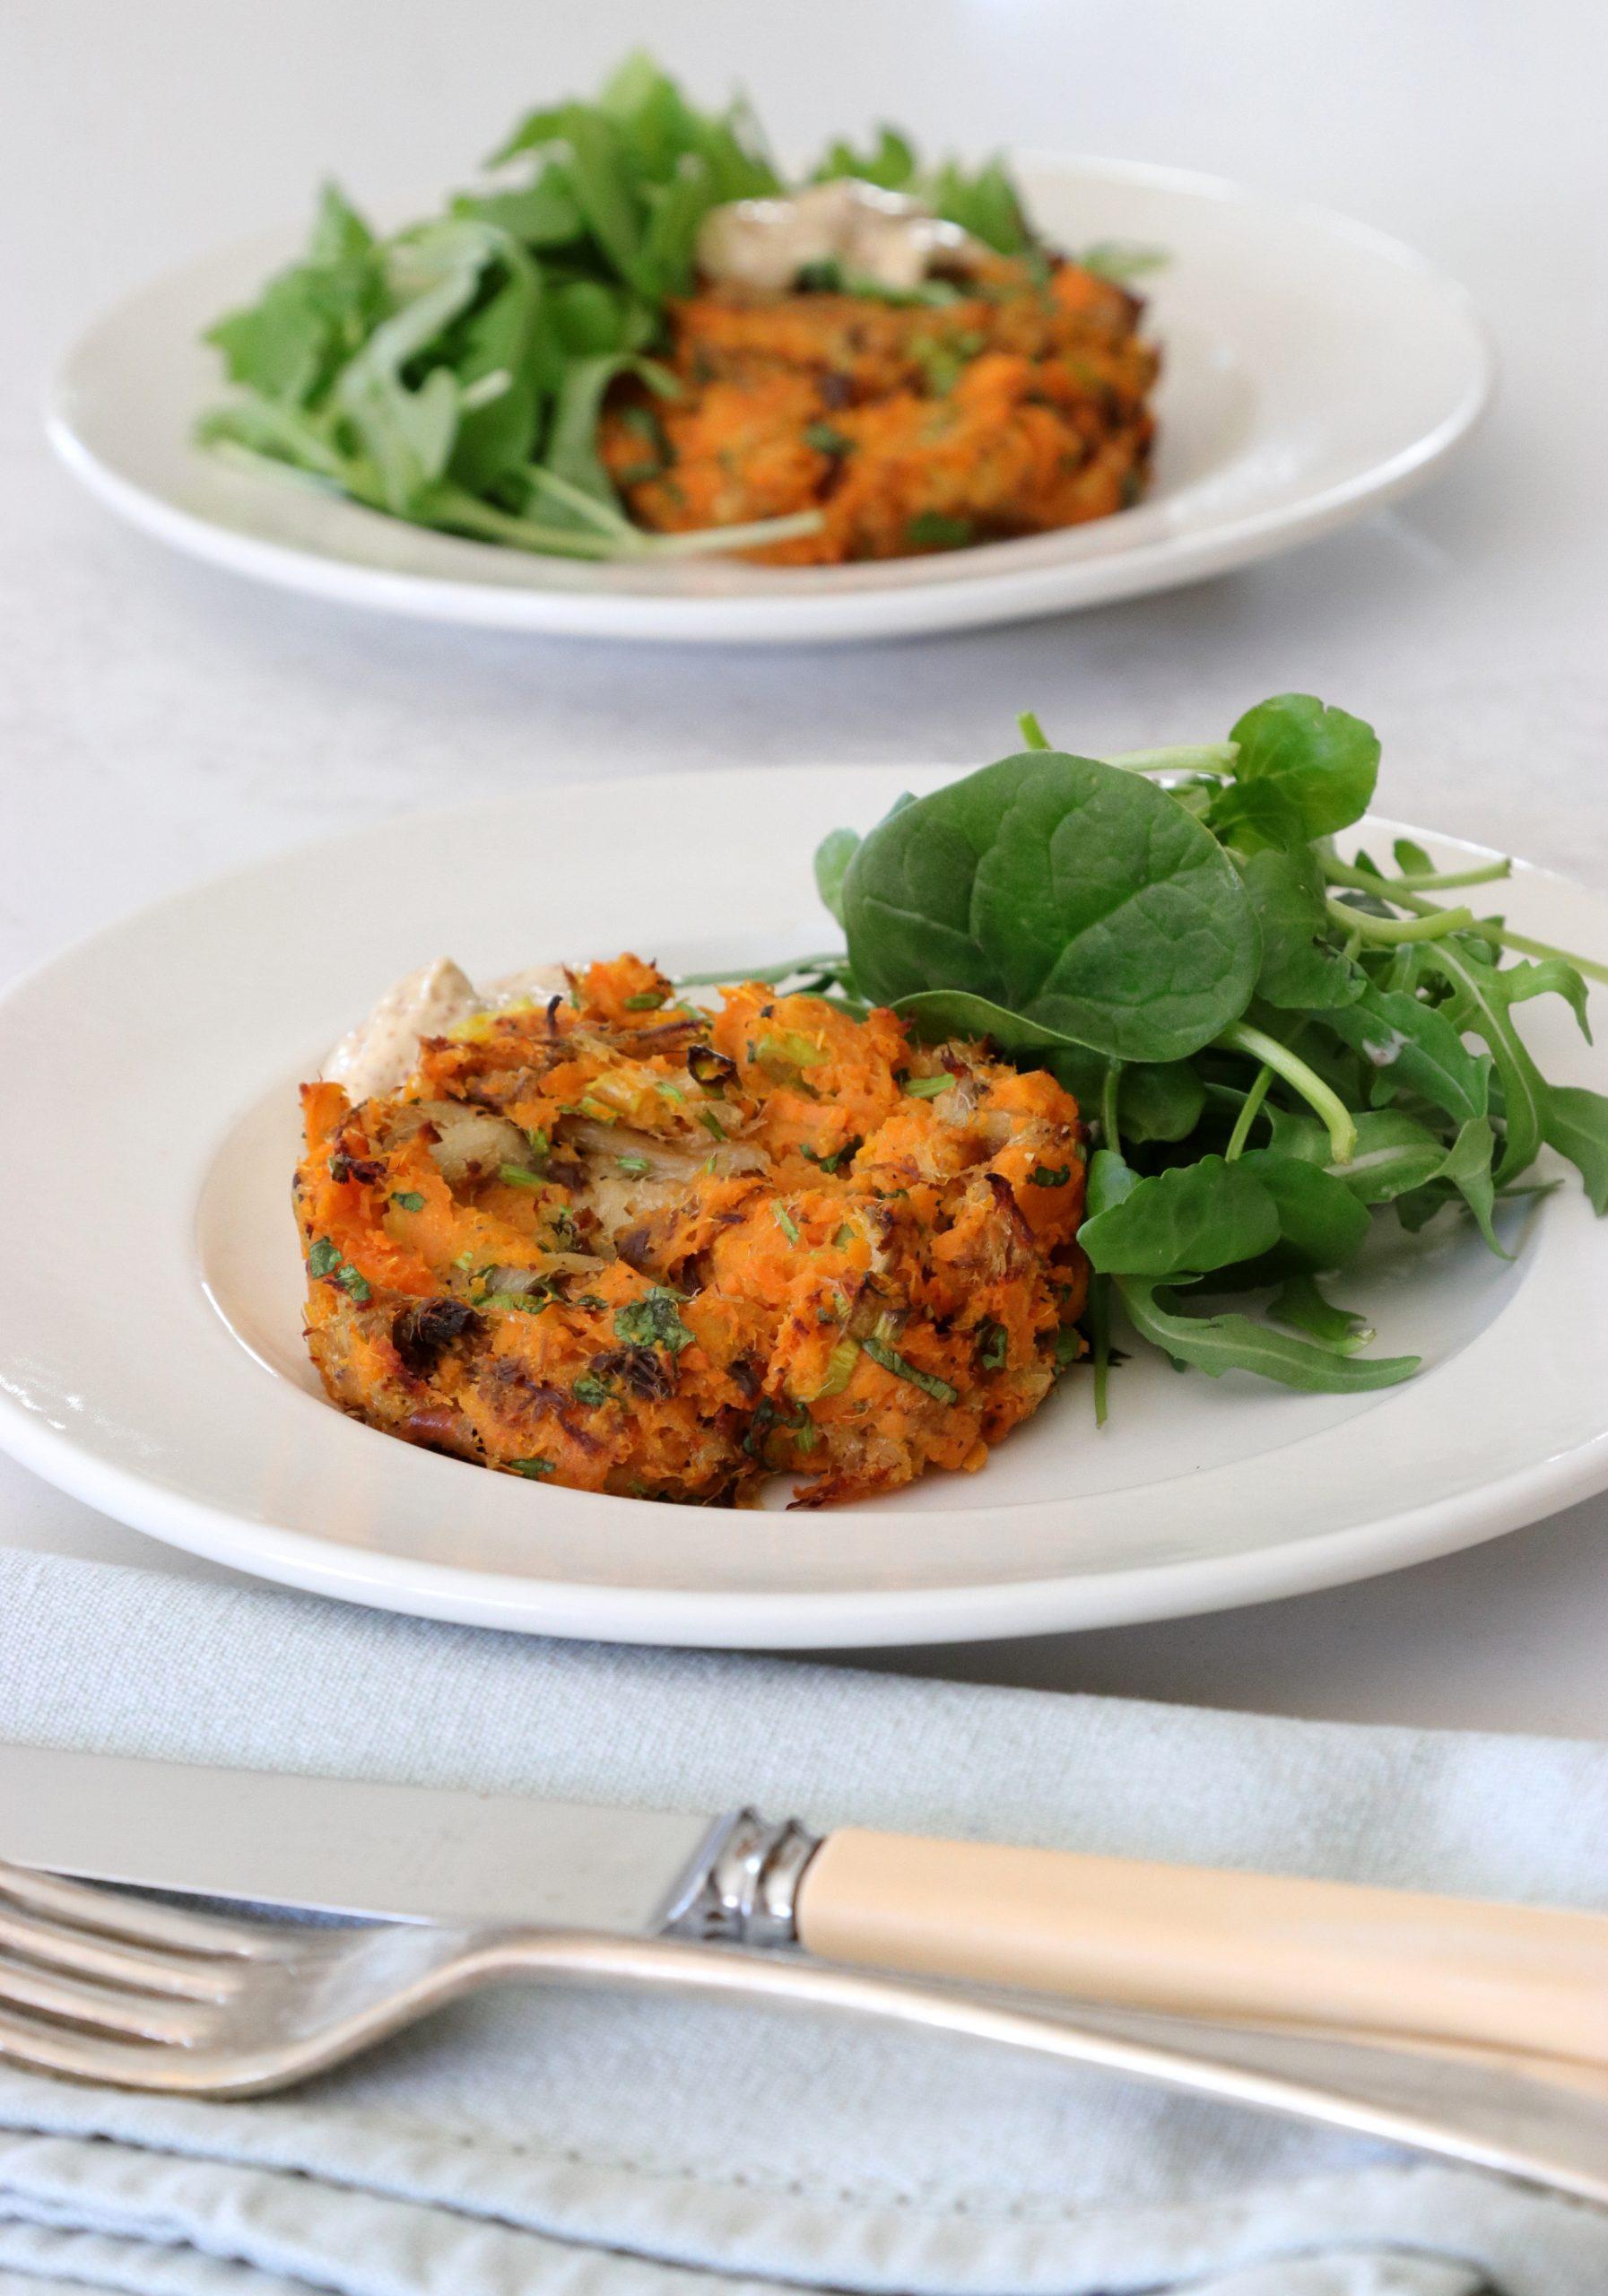 Mackerel fishcakes - Recipe notes - Humphrey Munson Blog